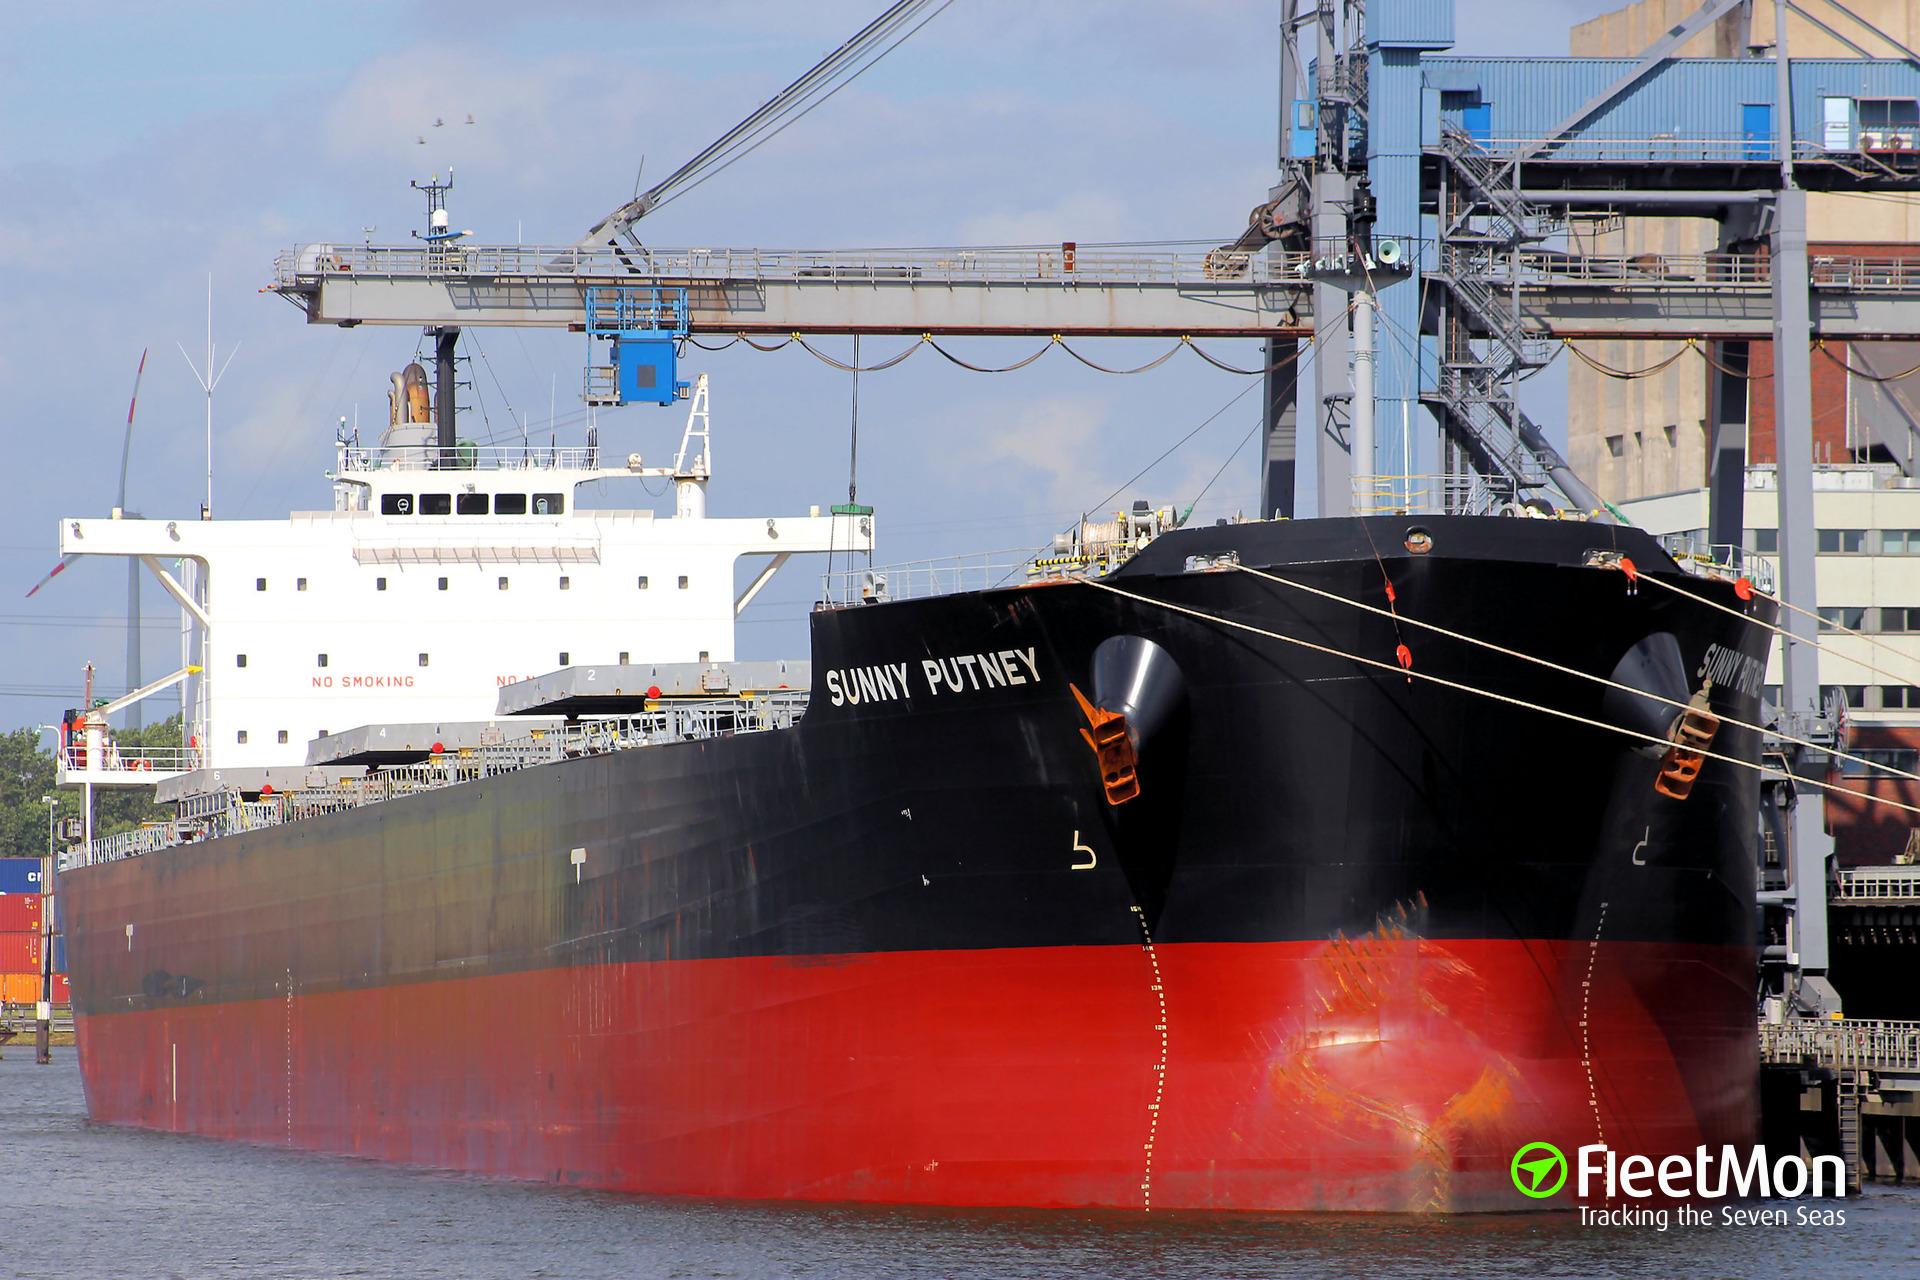 SUNNY PUTNEY cargo of coal fire, Brindisi